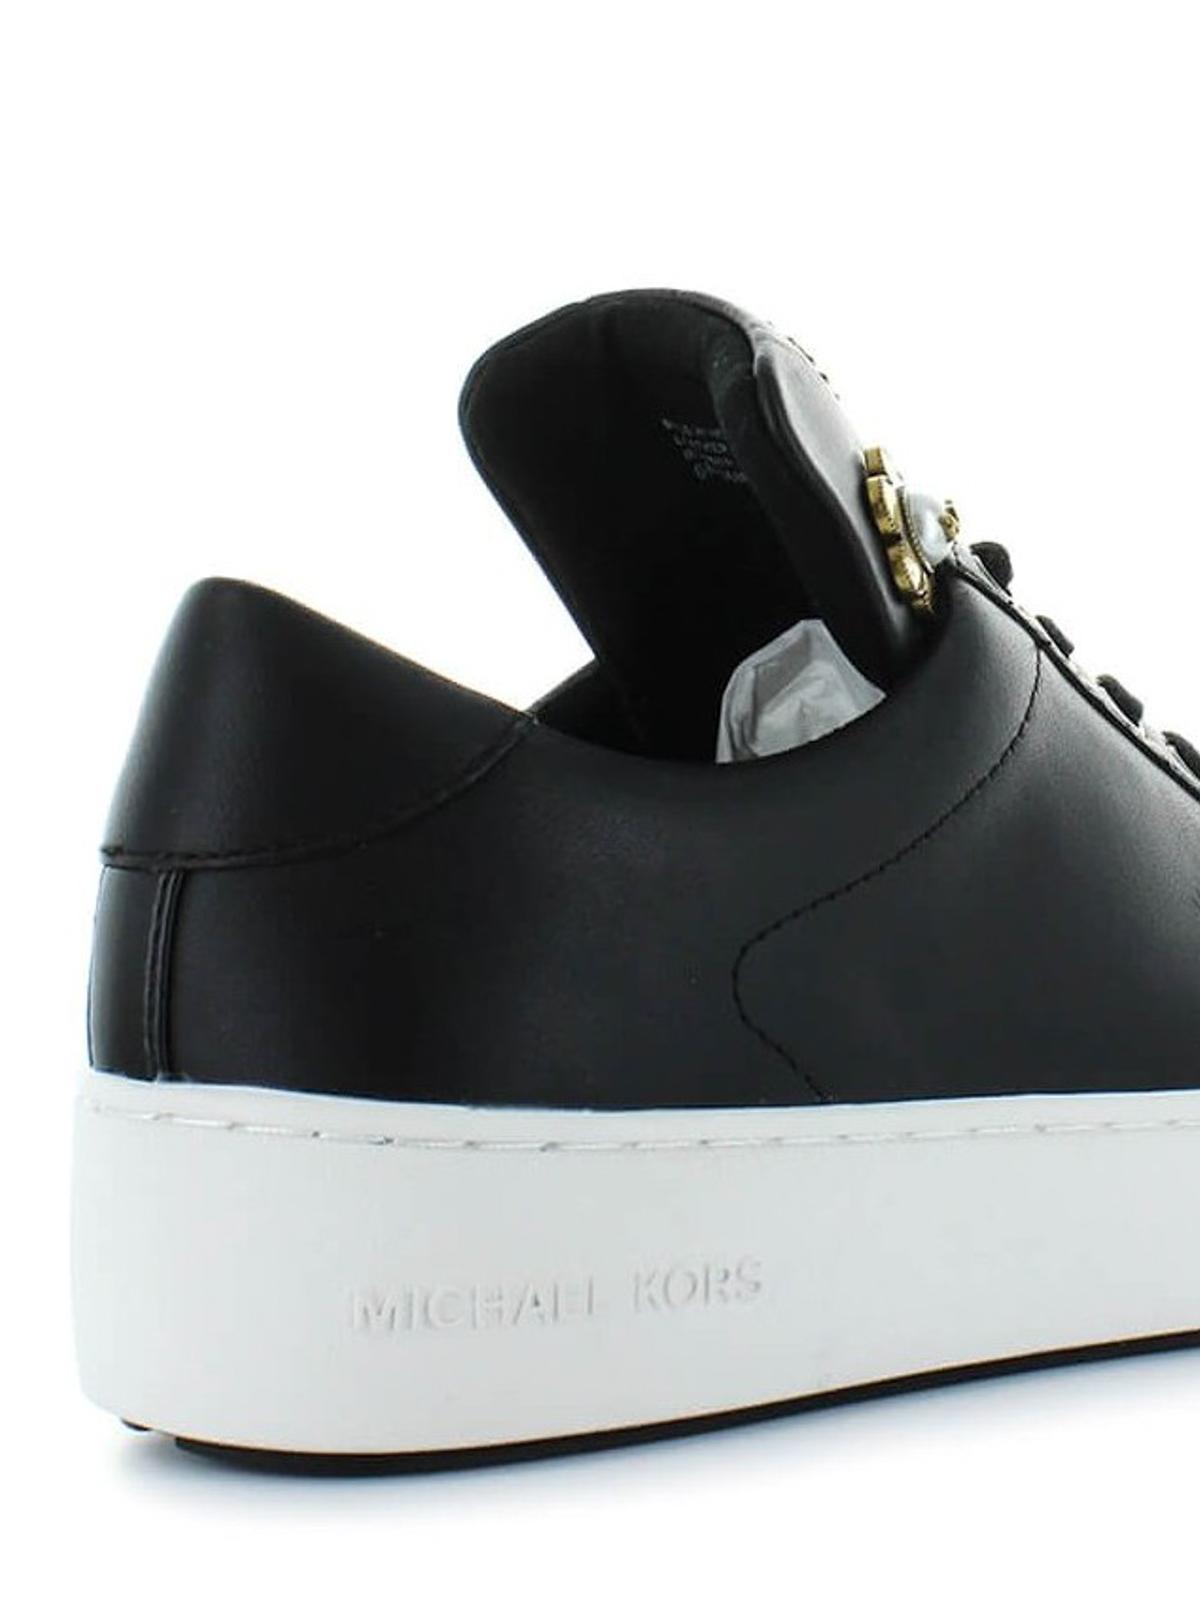 Mindy Linguetta Michael Decorata Kors Sneakers Maxi Sneaker Con OP0wZNknX8